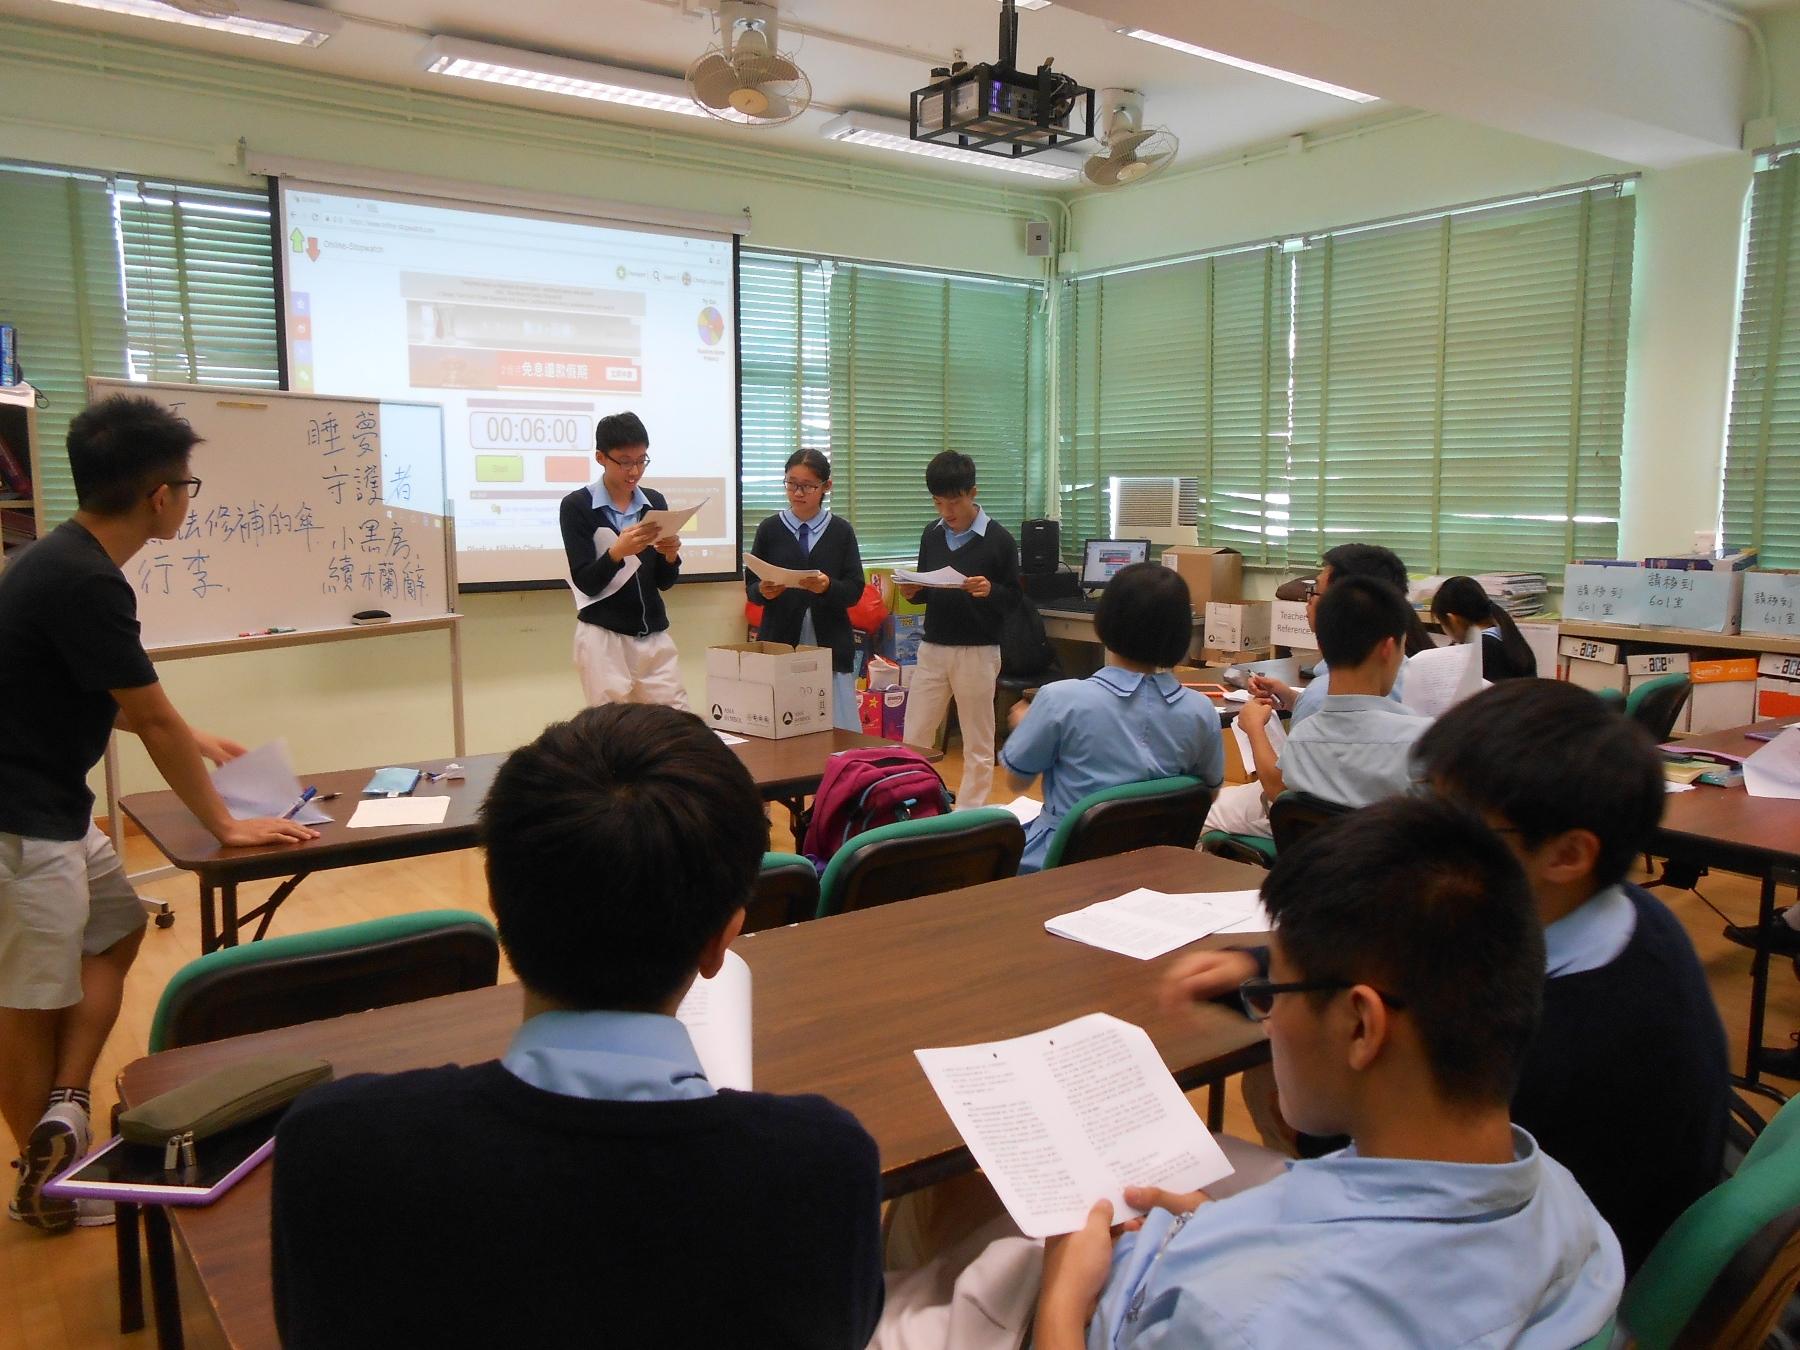 http://npc.edu.hk/sites/default/files/dscn0056.jpg